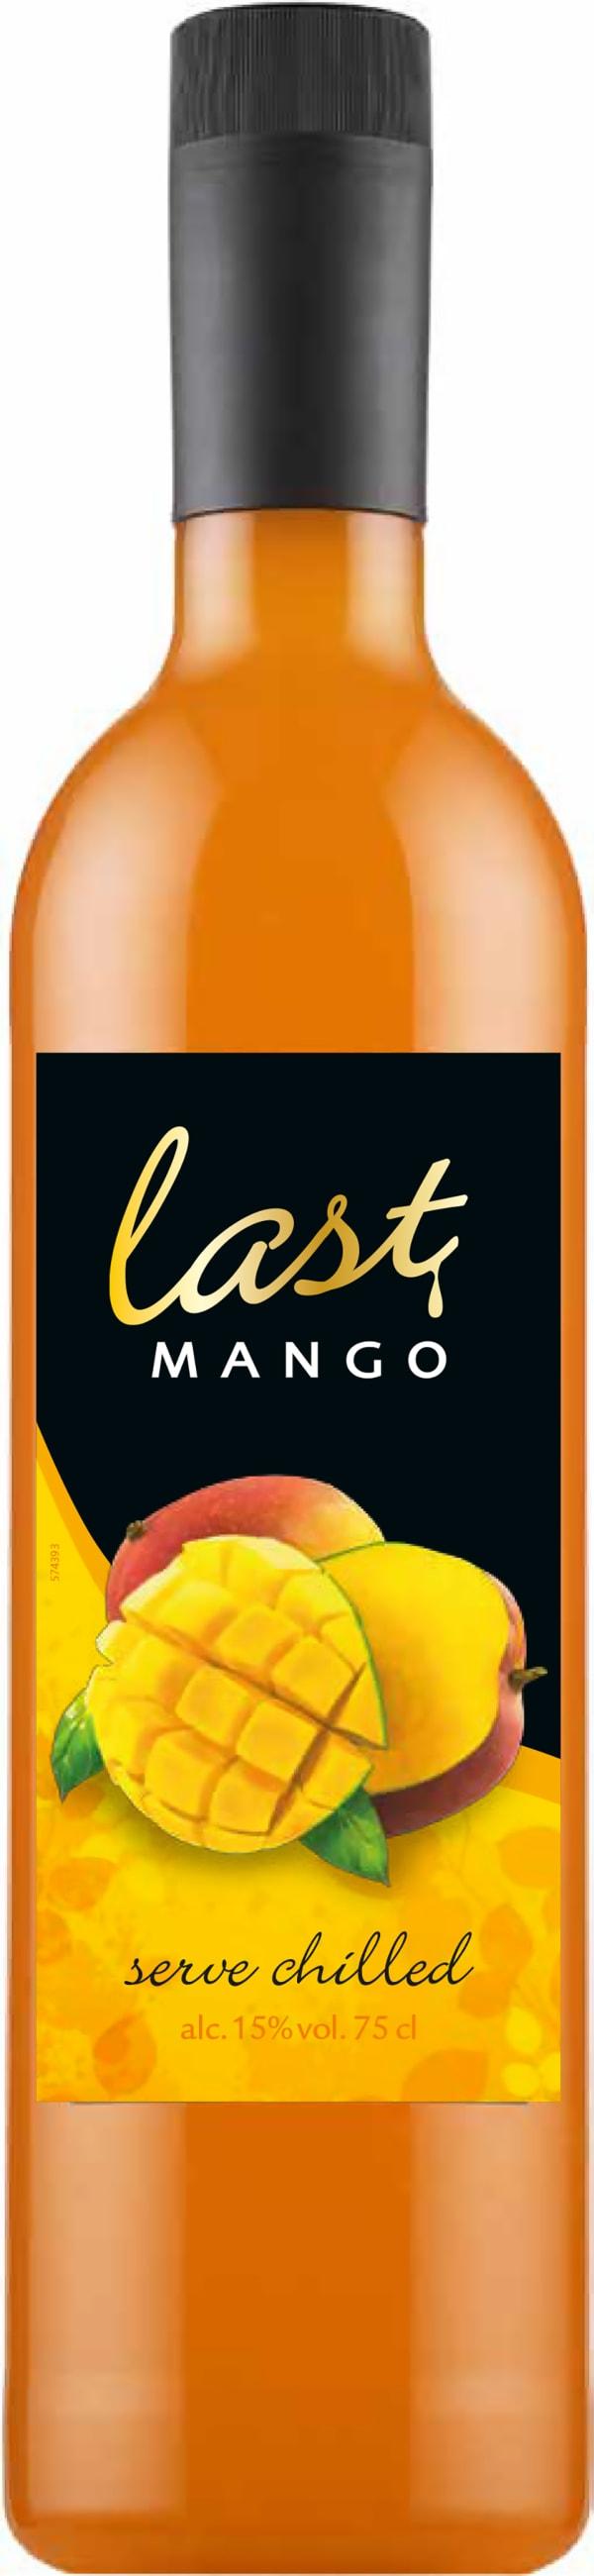 Last Mango plastic bottle